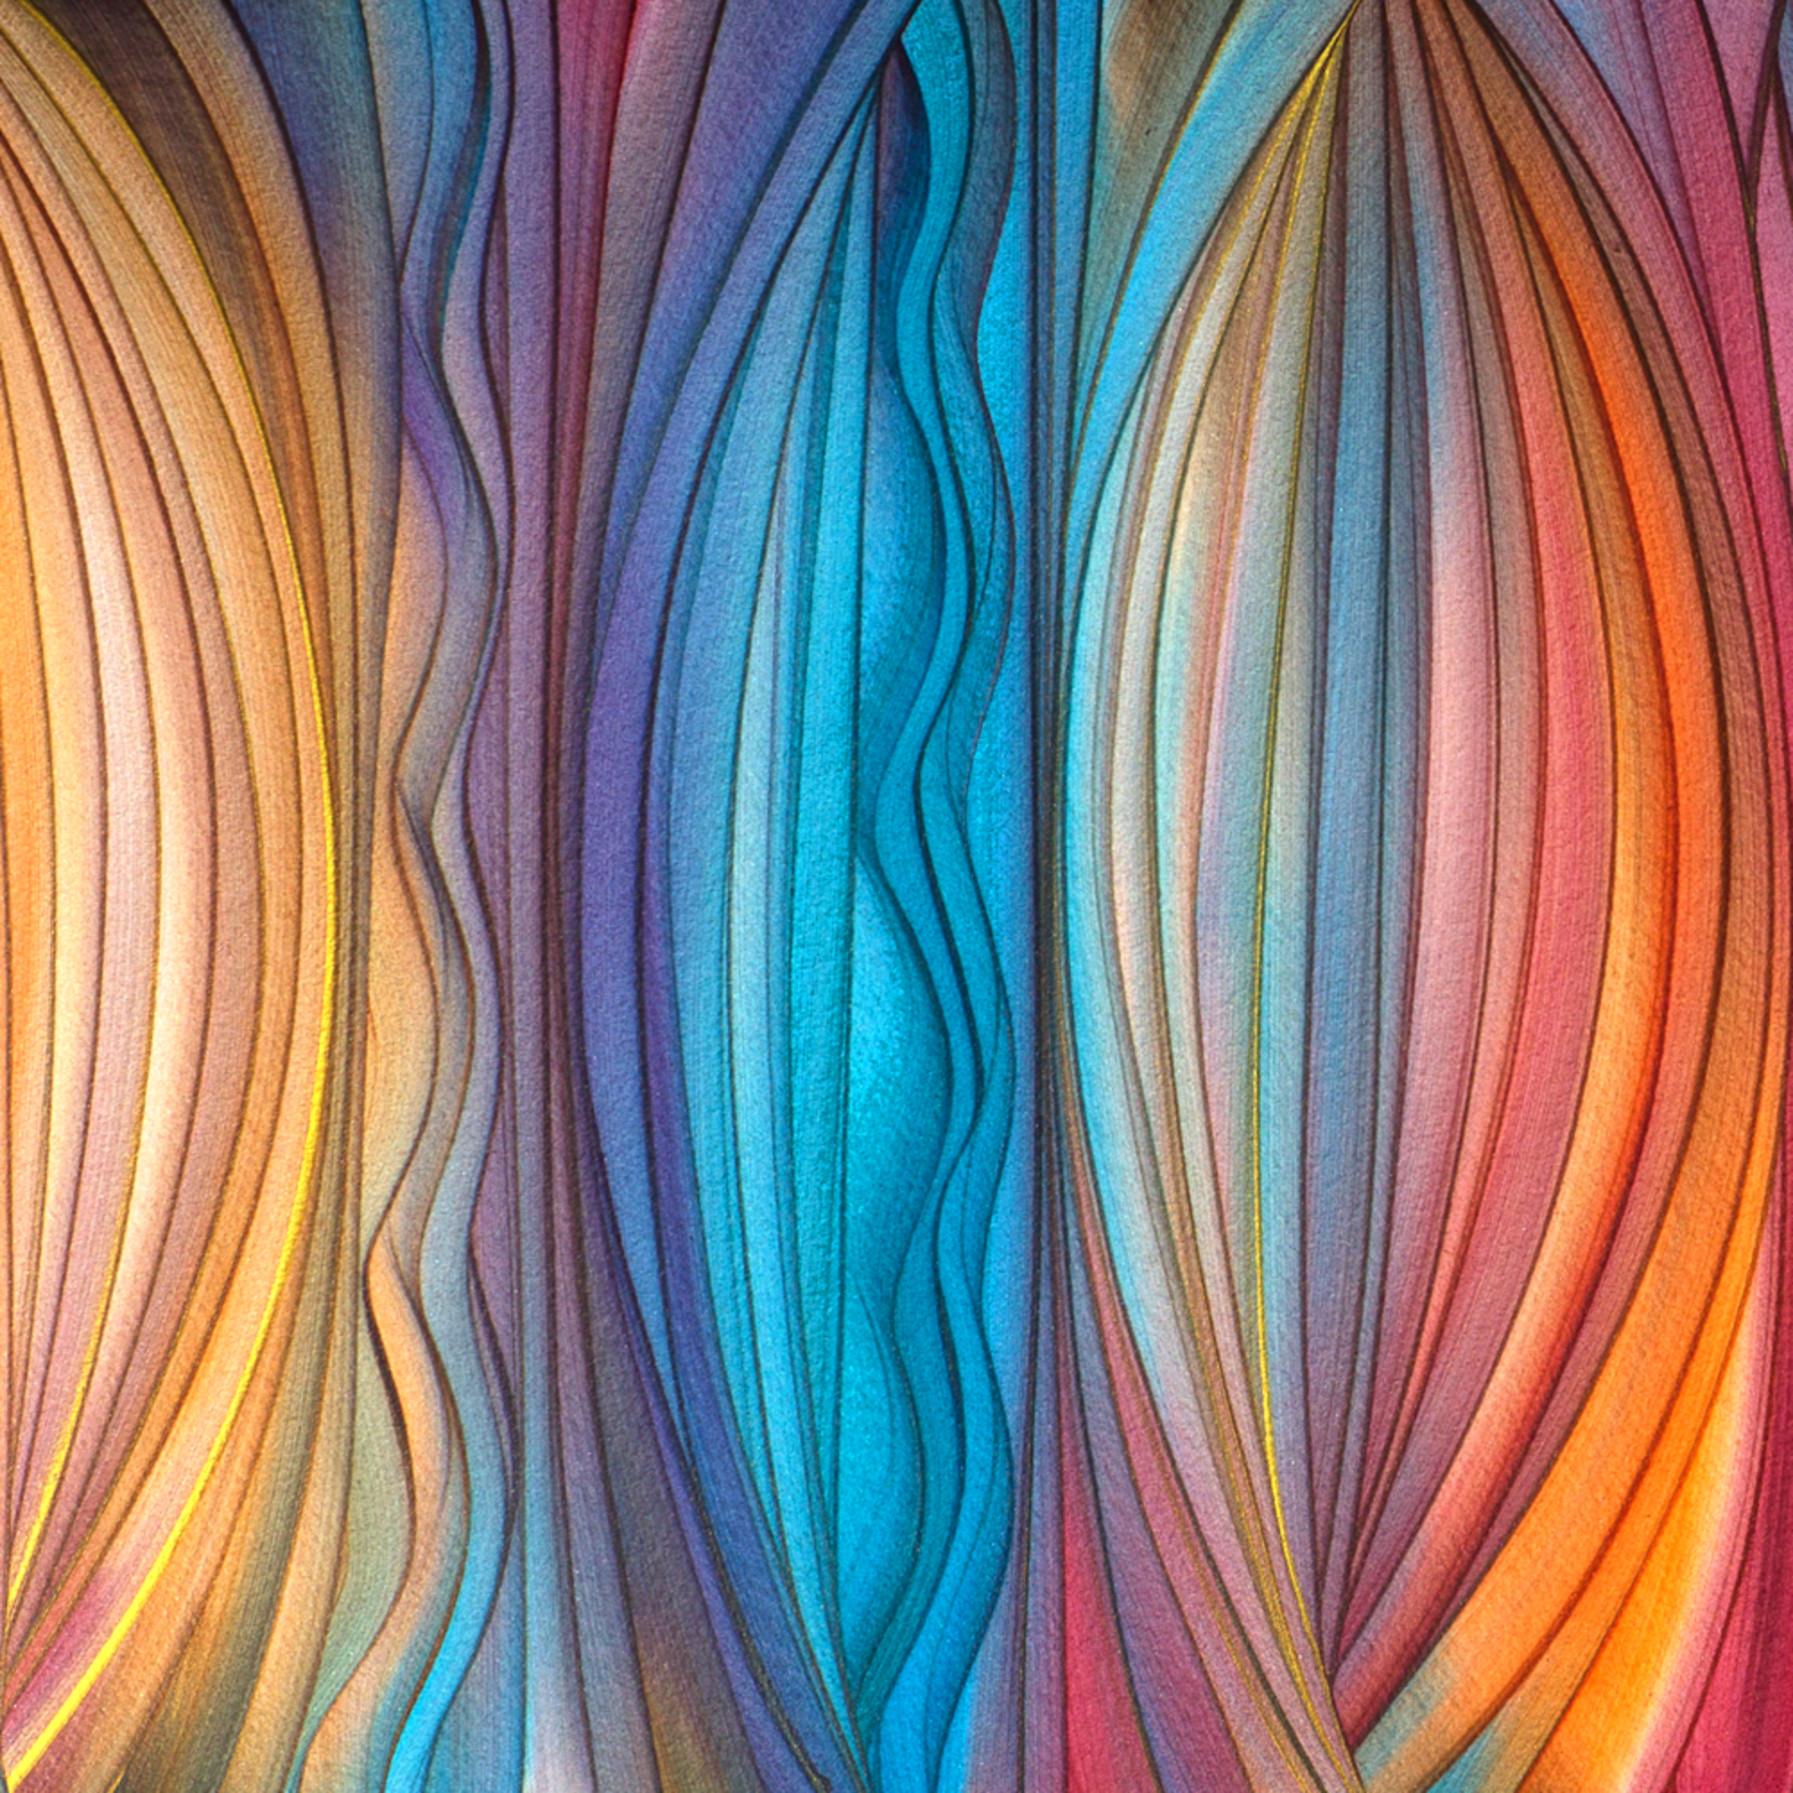 Colorcube11 px6yor